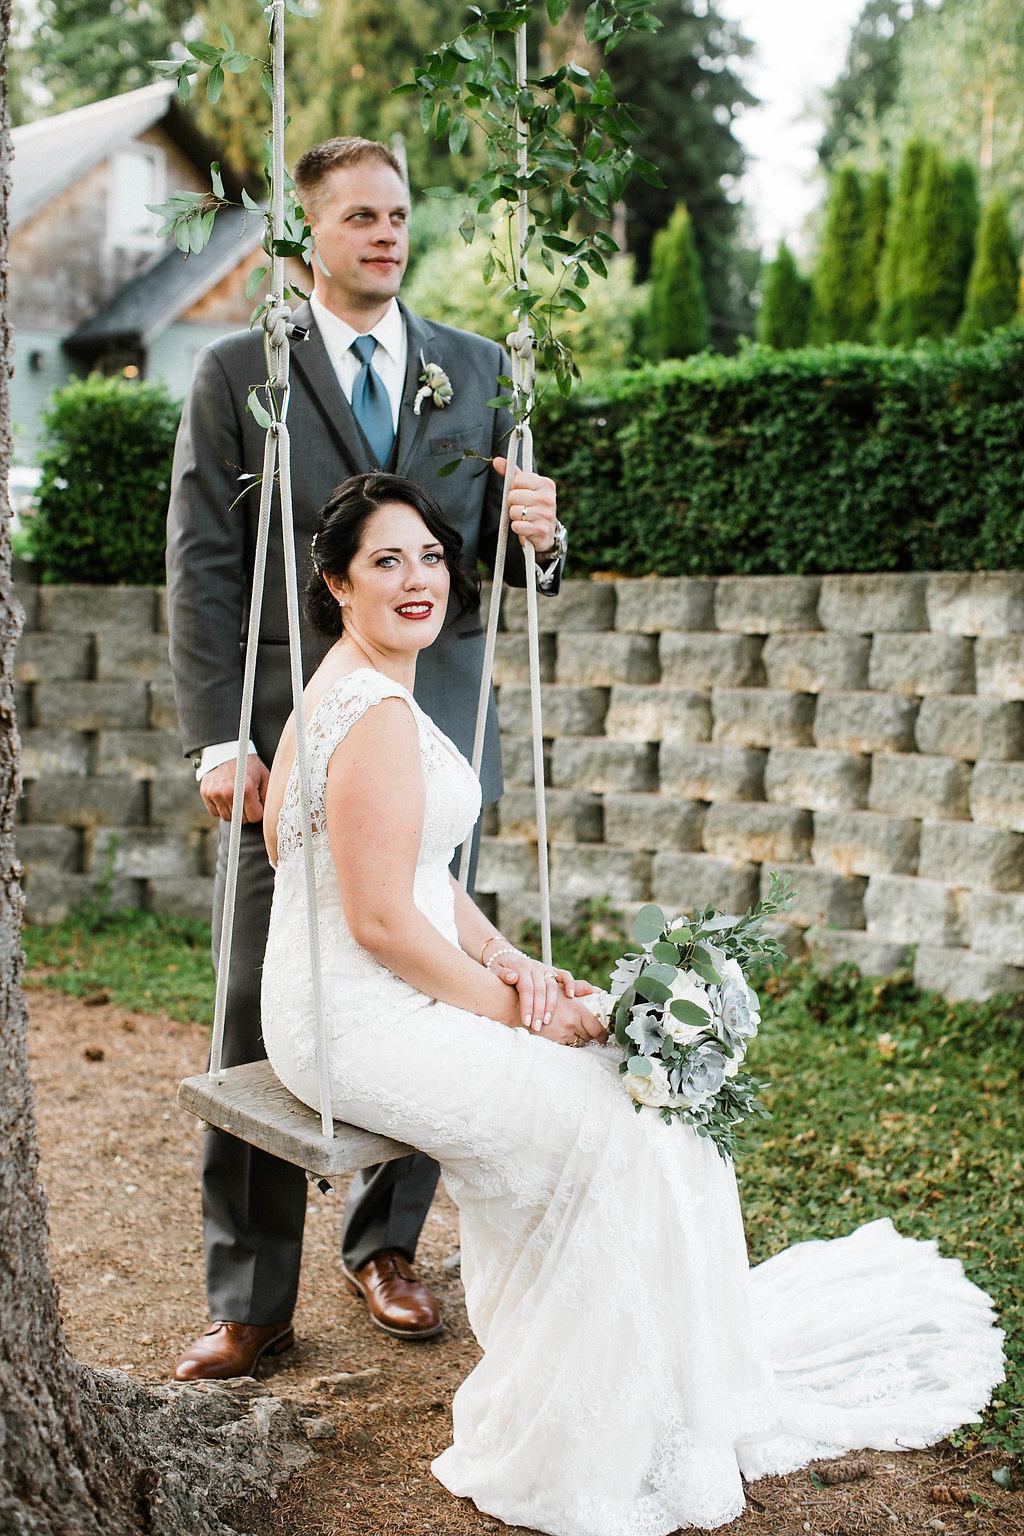 The_Green_Gates_at_Flowing_Lake_Wedding_Alissa+Dan_by_Adina_Preston_Weddings_1175.JPG